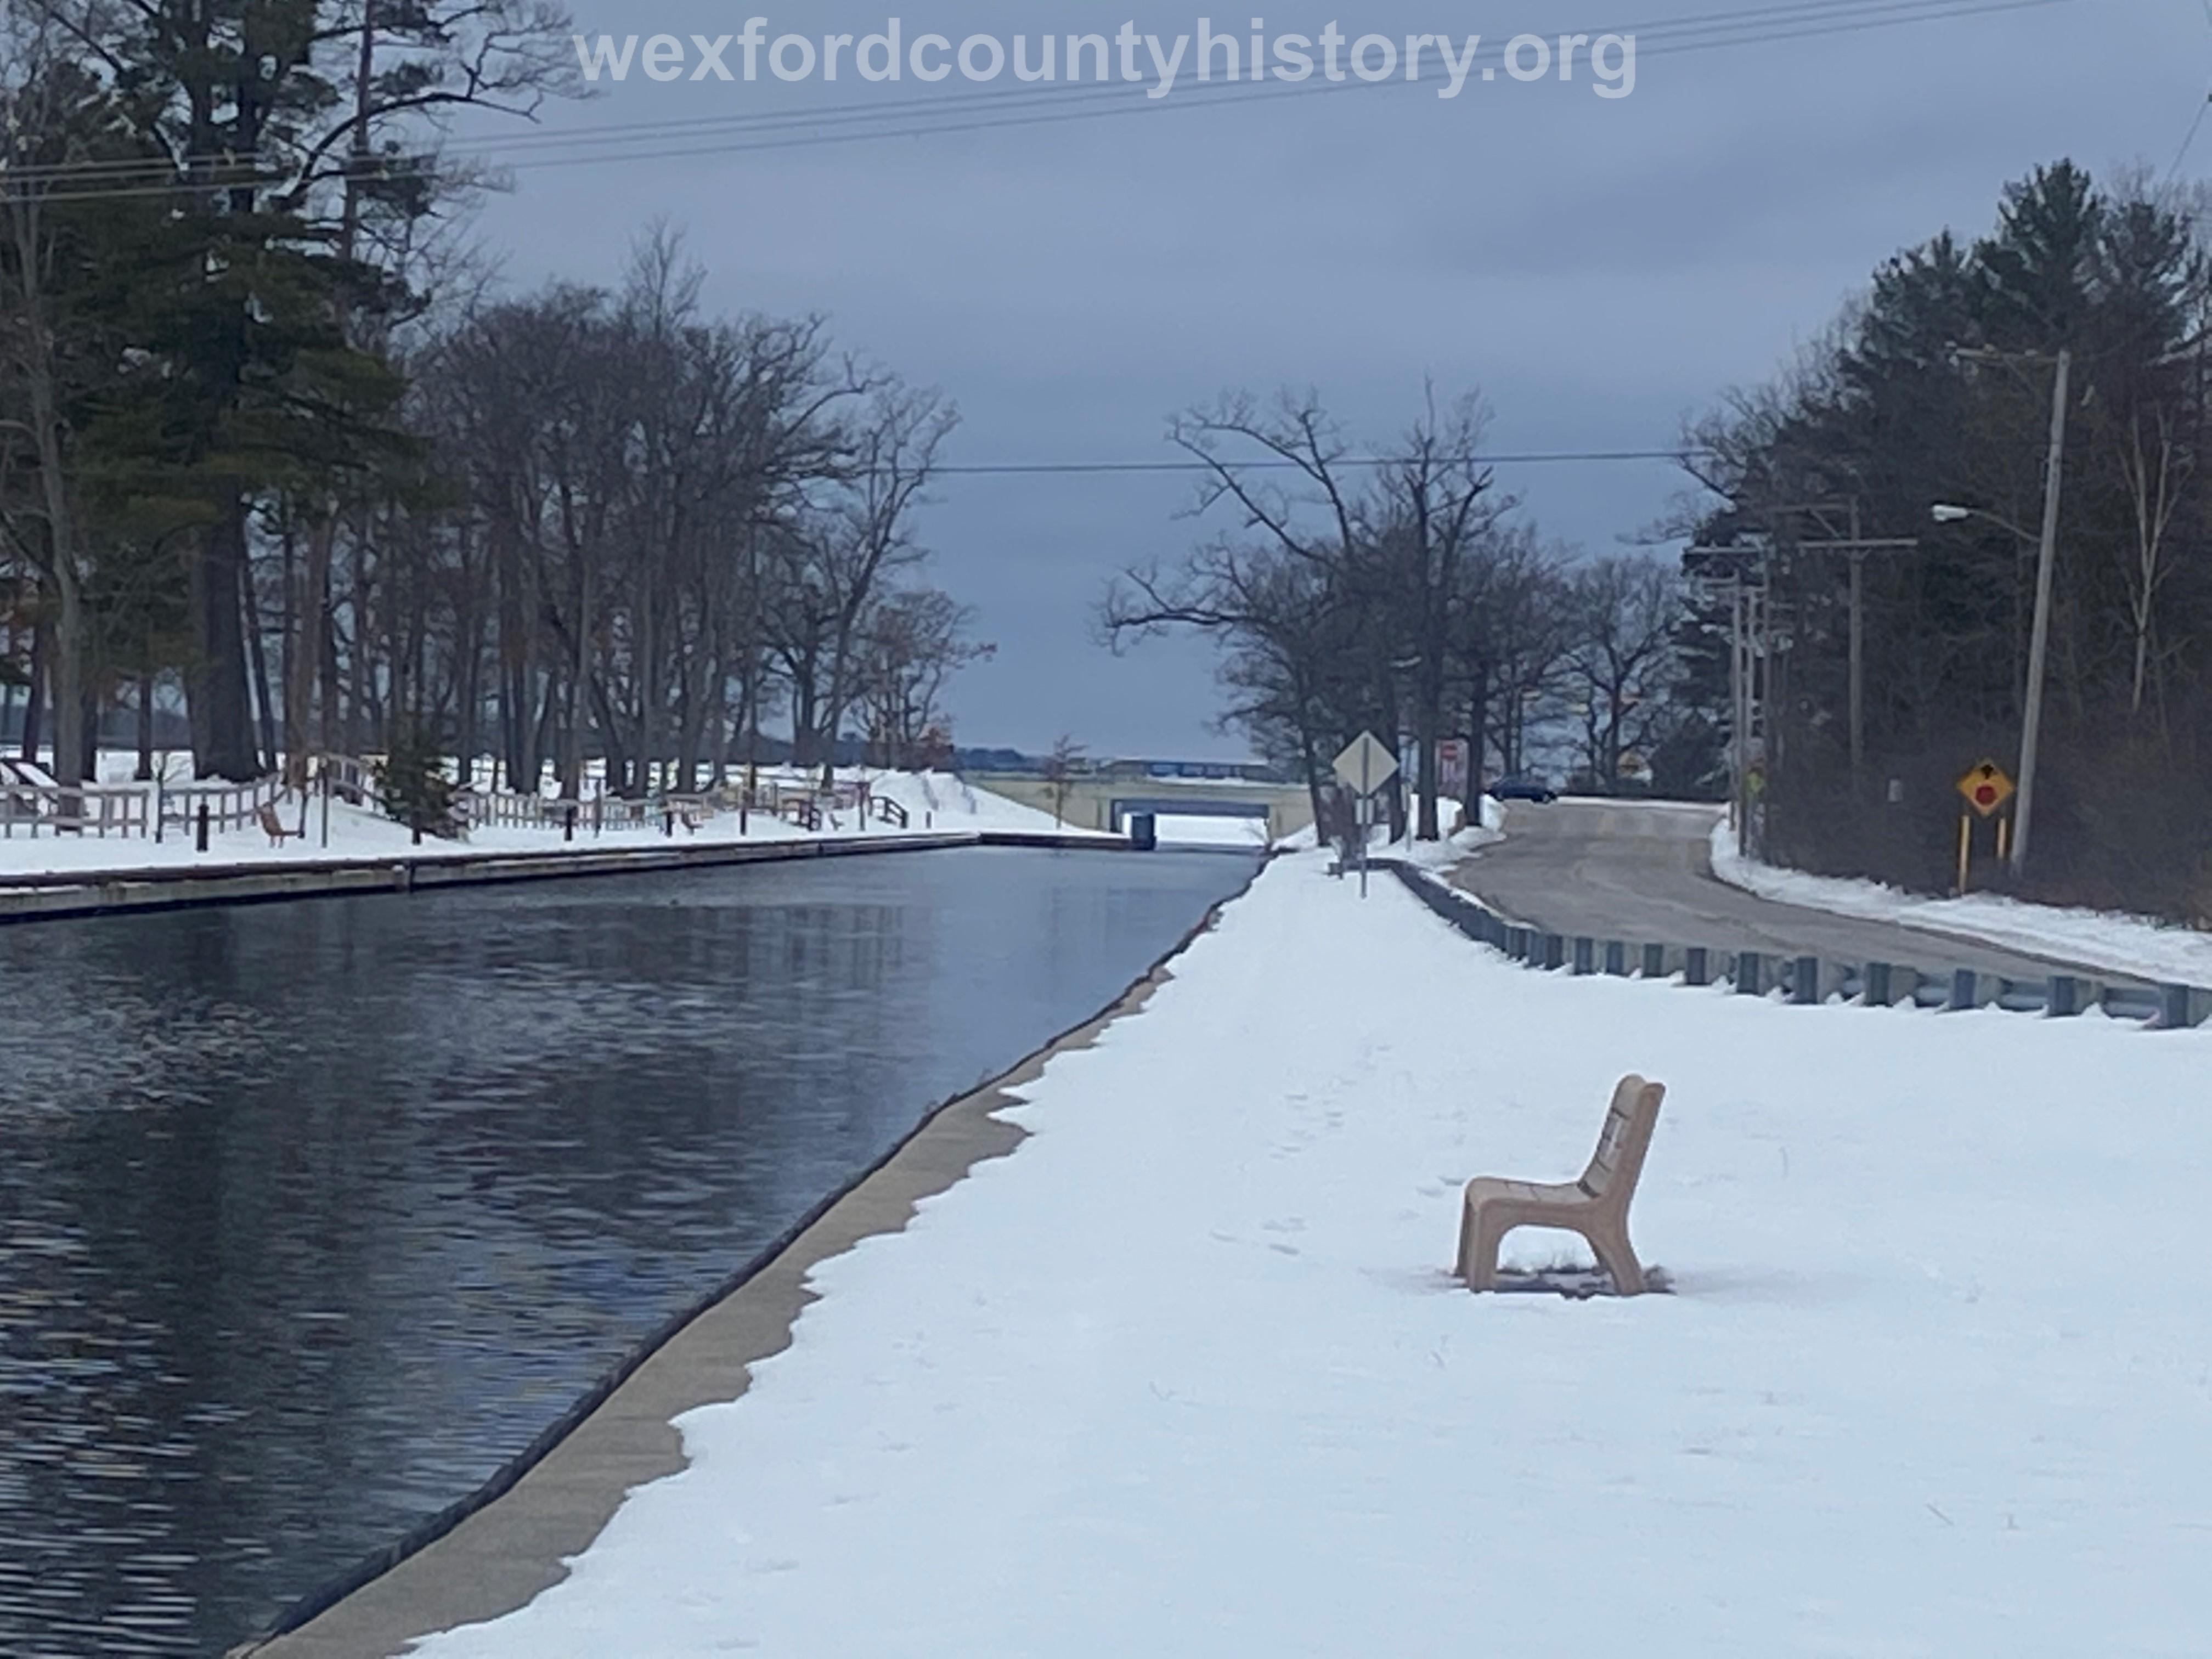 Cadillac-Recreation-The-Canal-January-29-2020-6